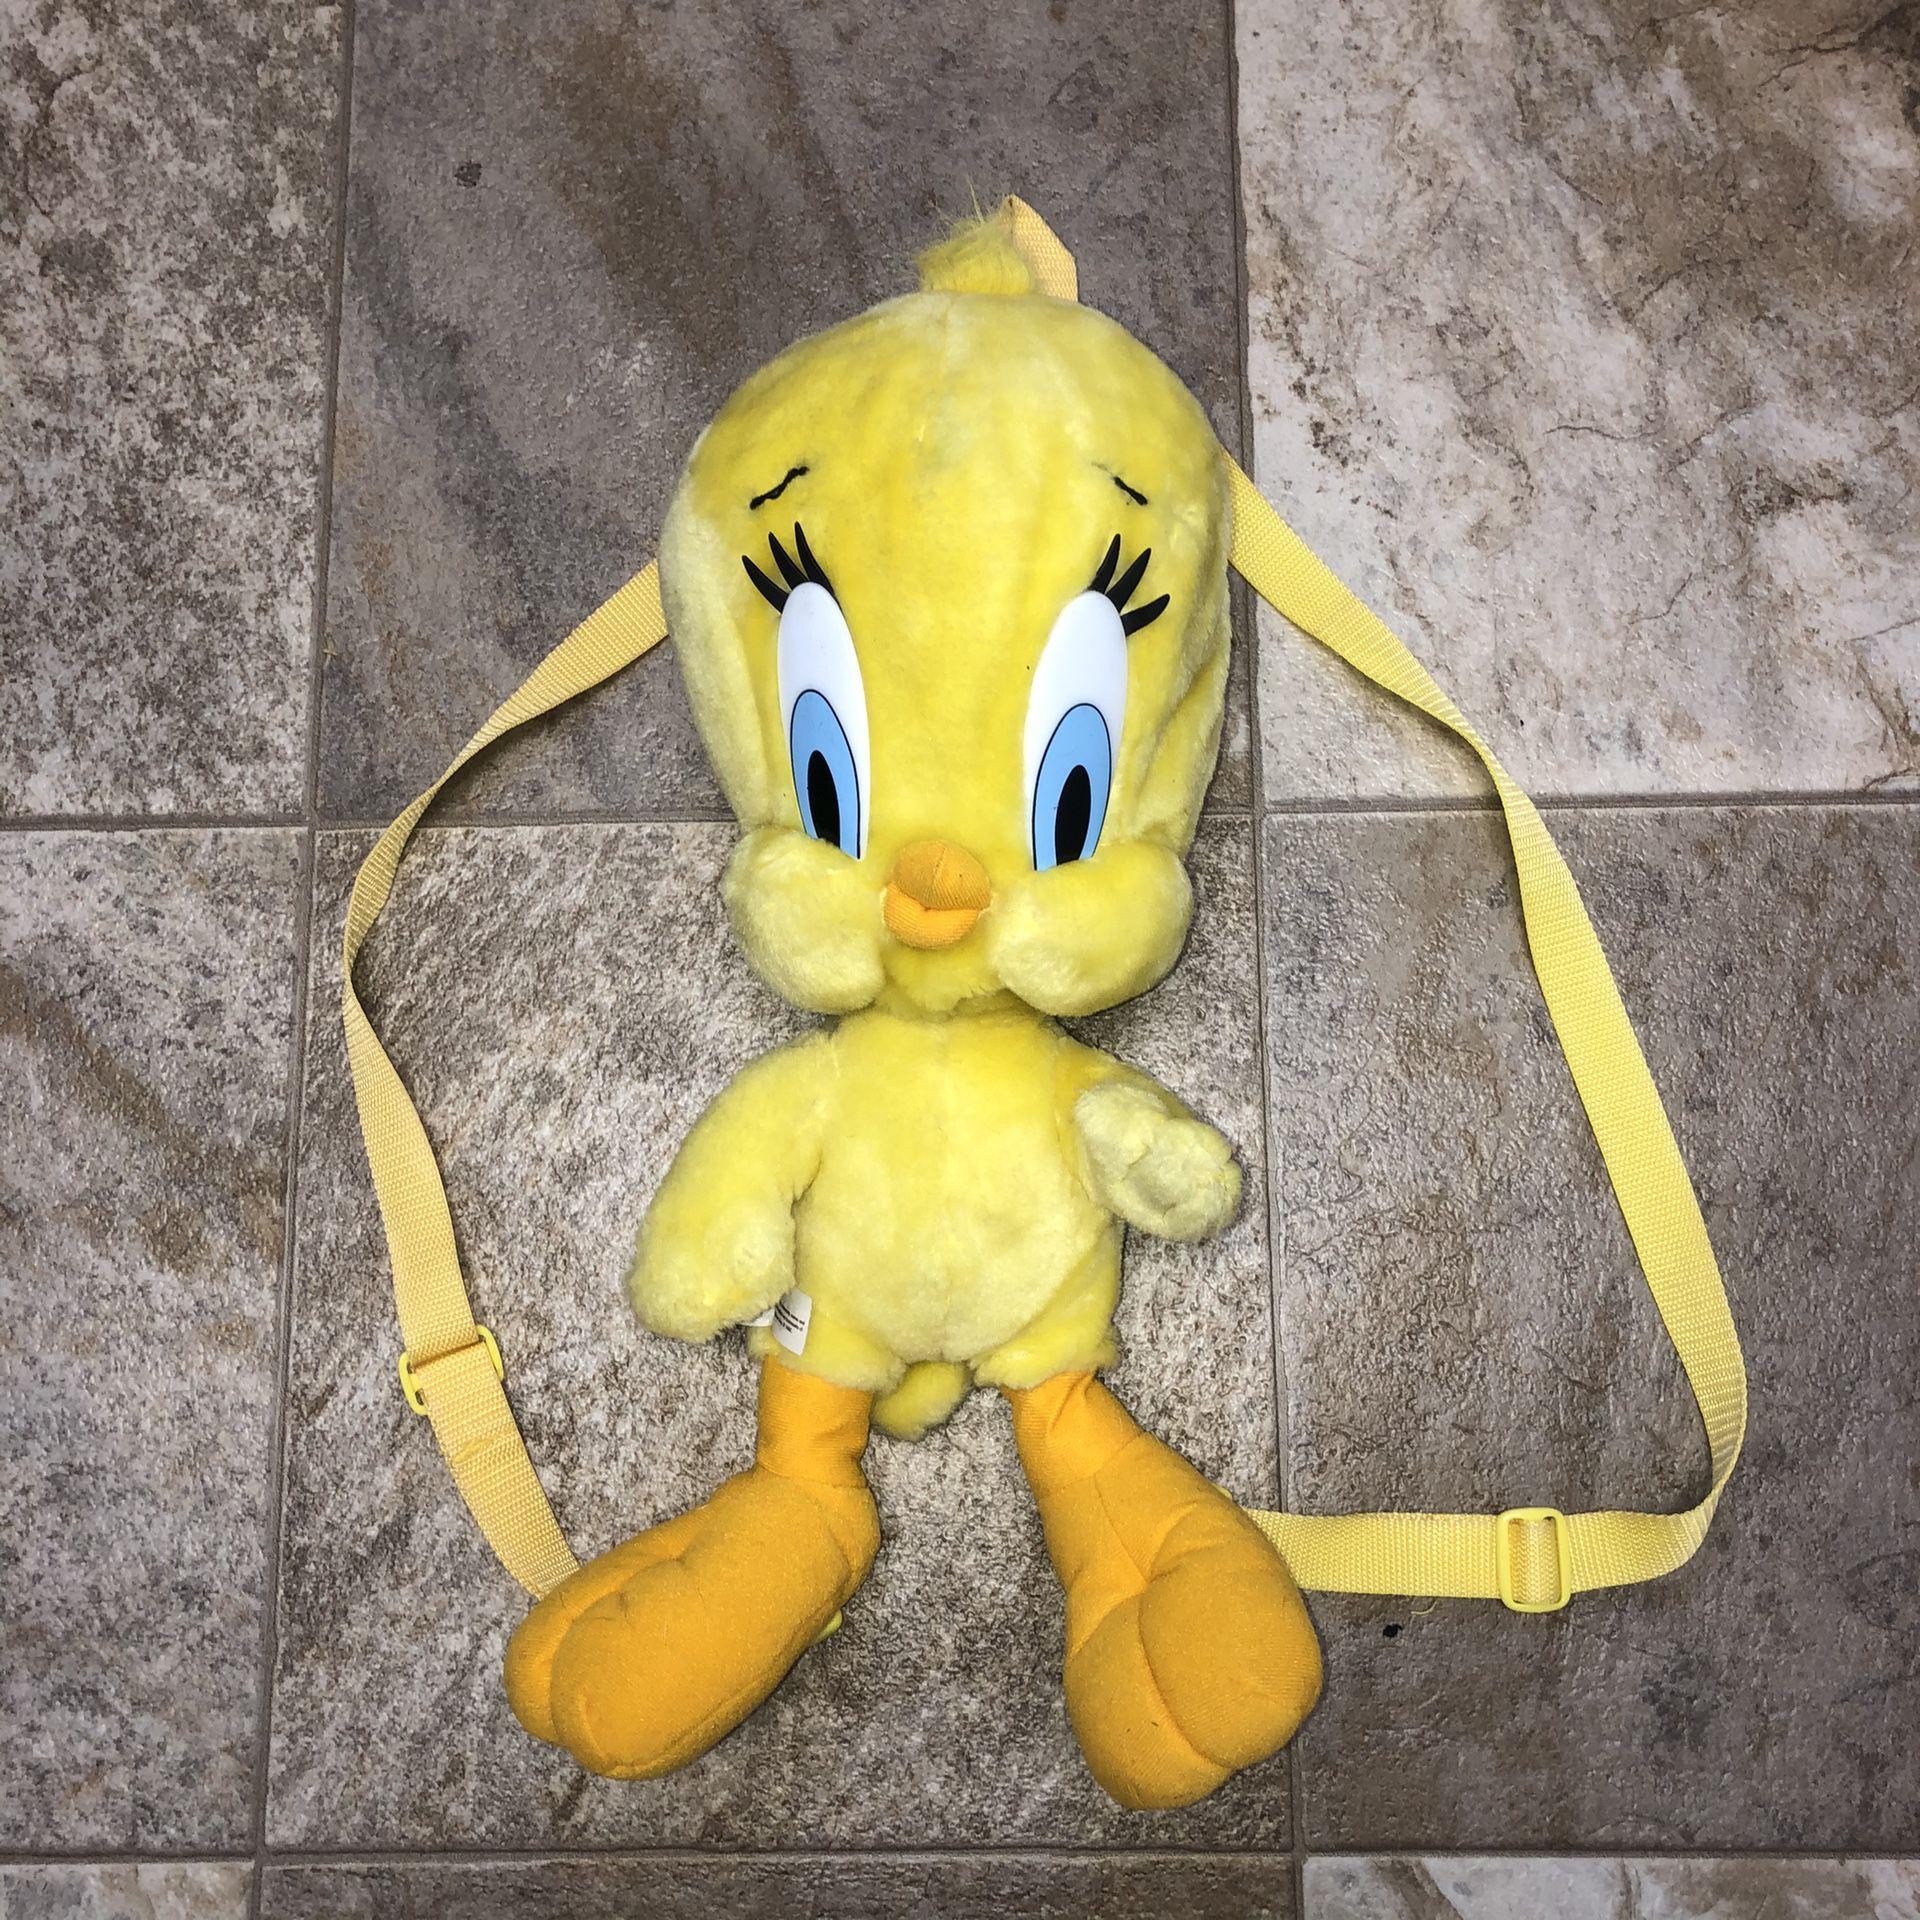 1990s Tweety Bird BackPack